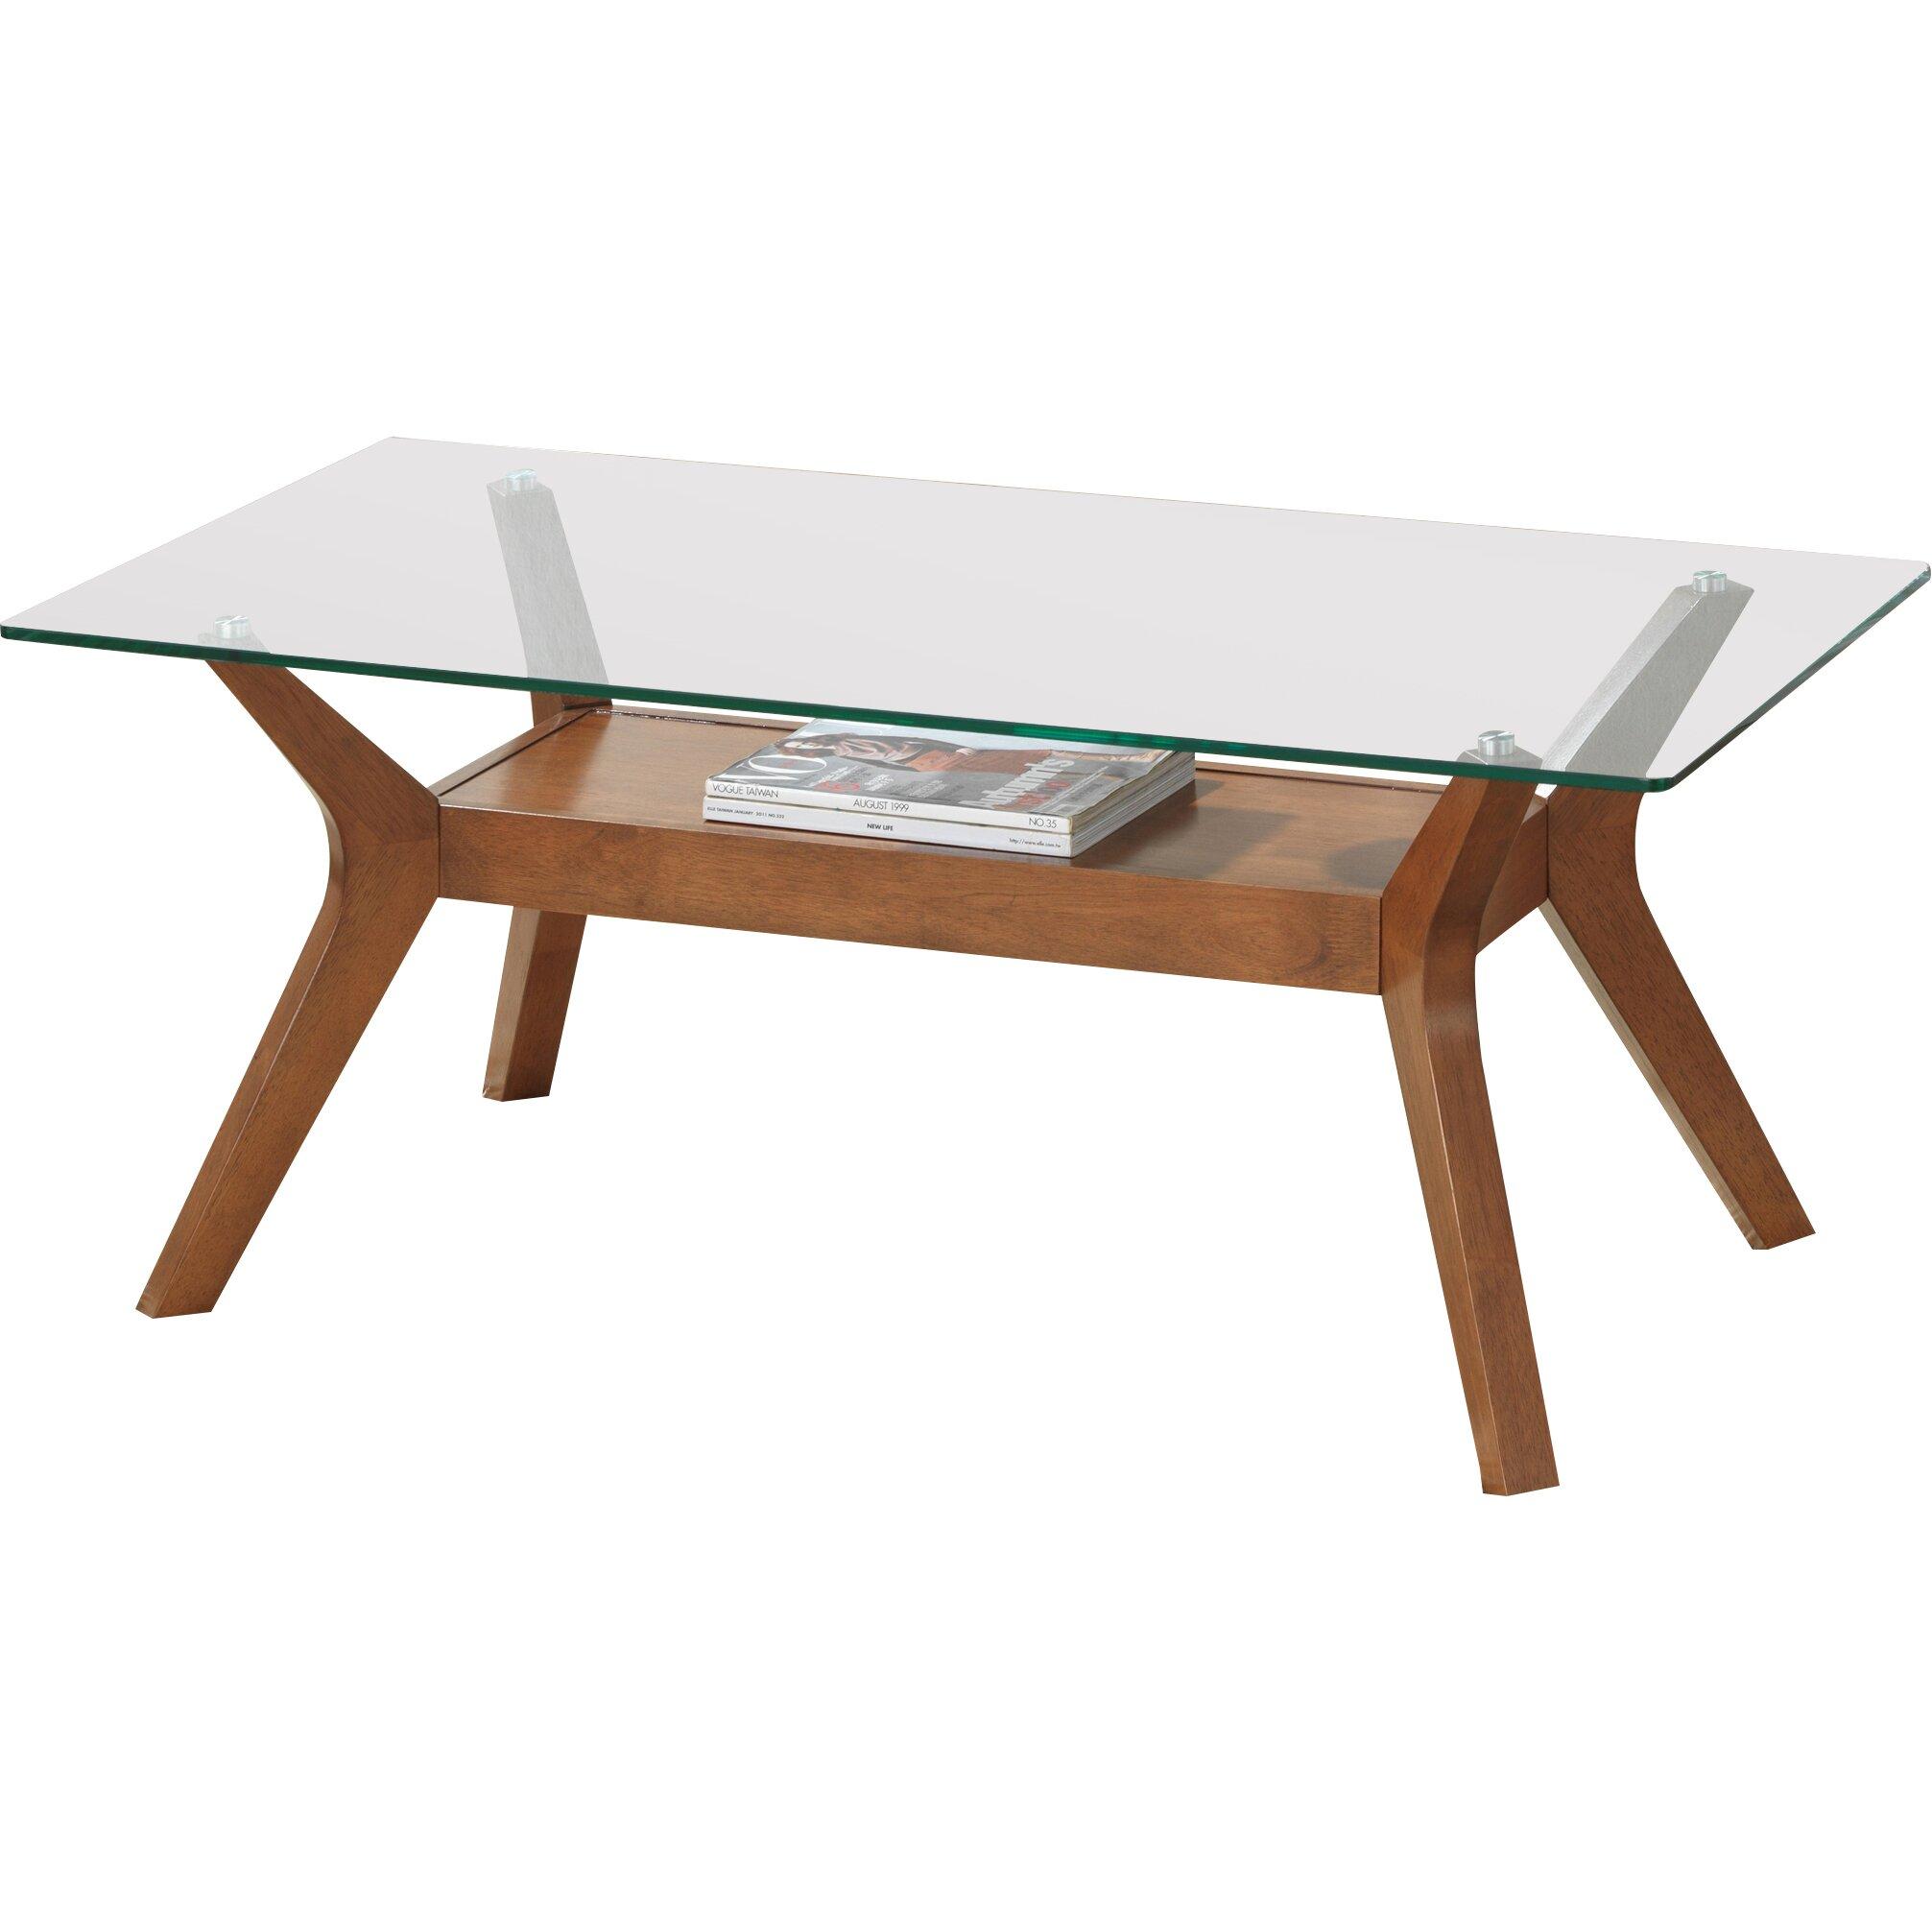 Wayfair Glass Coffee Table Uk: Homestead Living Coffee Table & Reviews